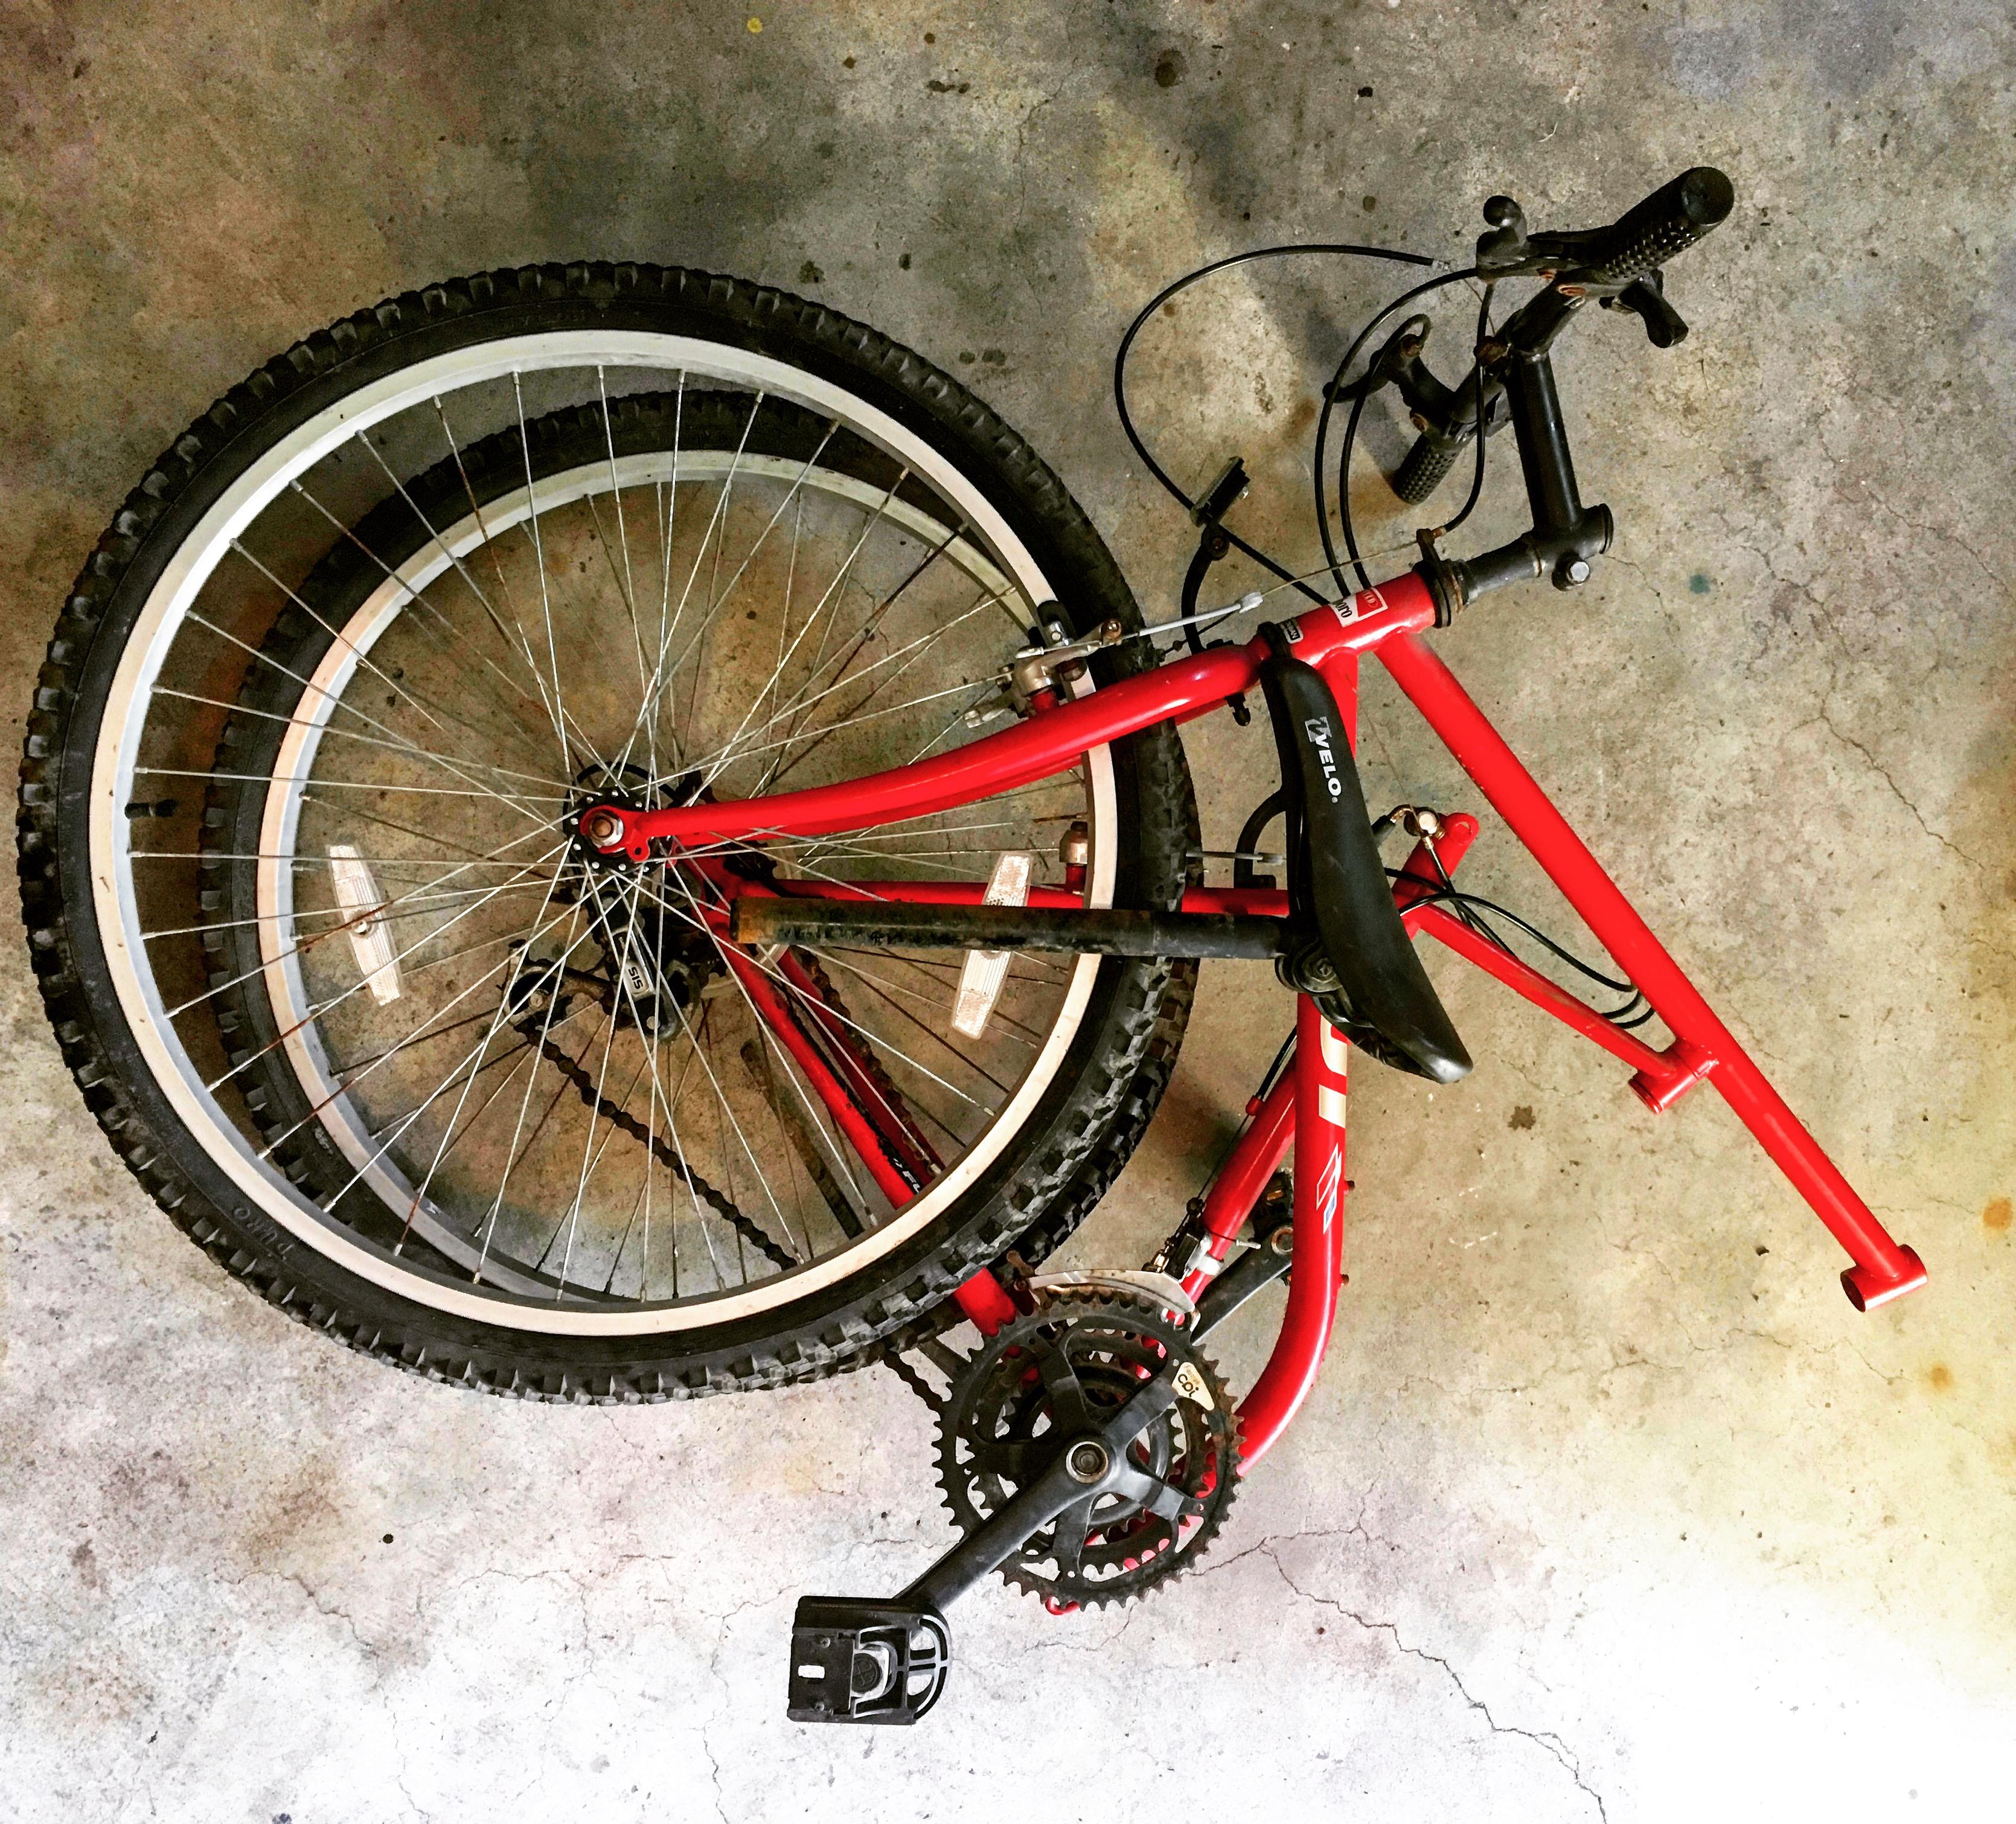 Fuji Marlboro Folding Bike | LocoJoe Bikes